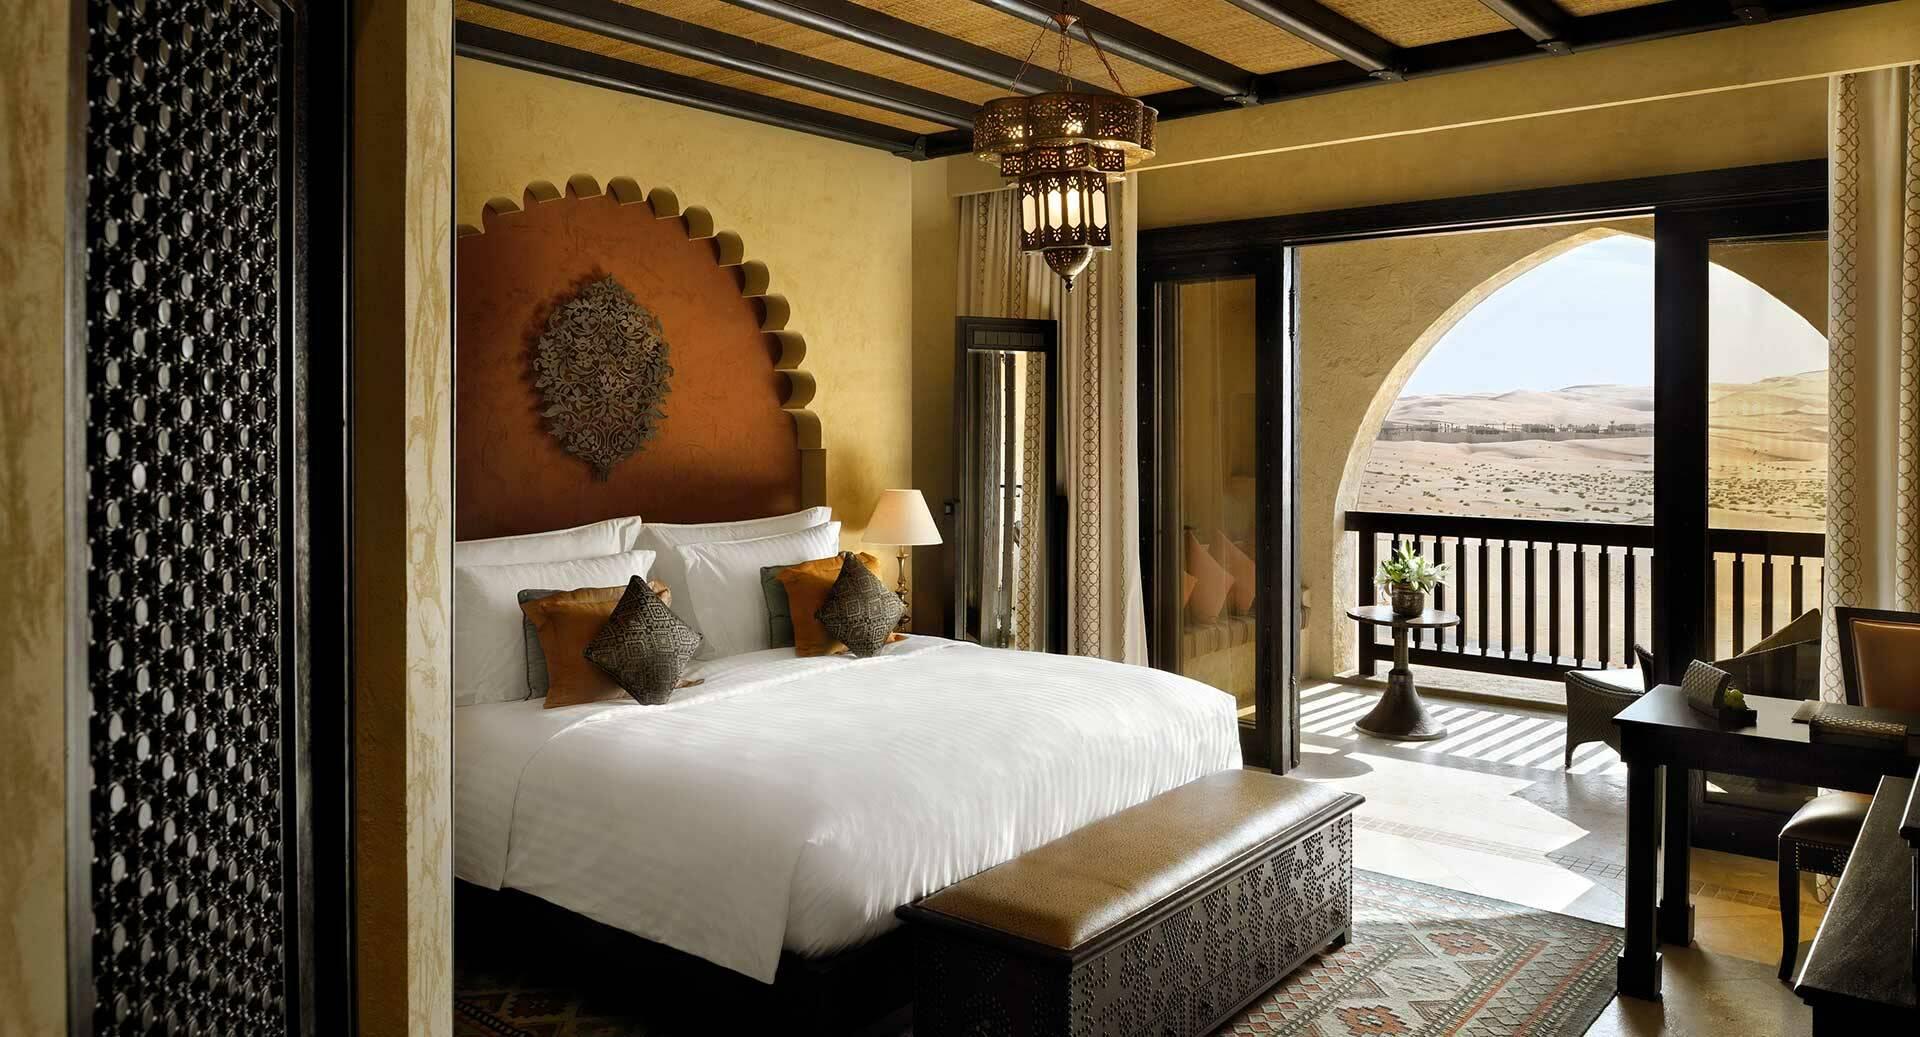 Abu Dhabi Anantara Qasr al Sarab Desert deluxe balcony room